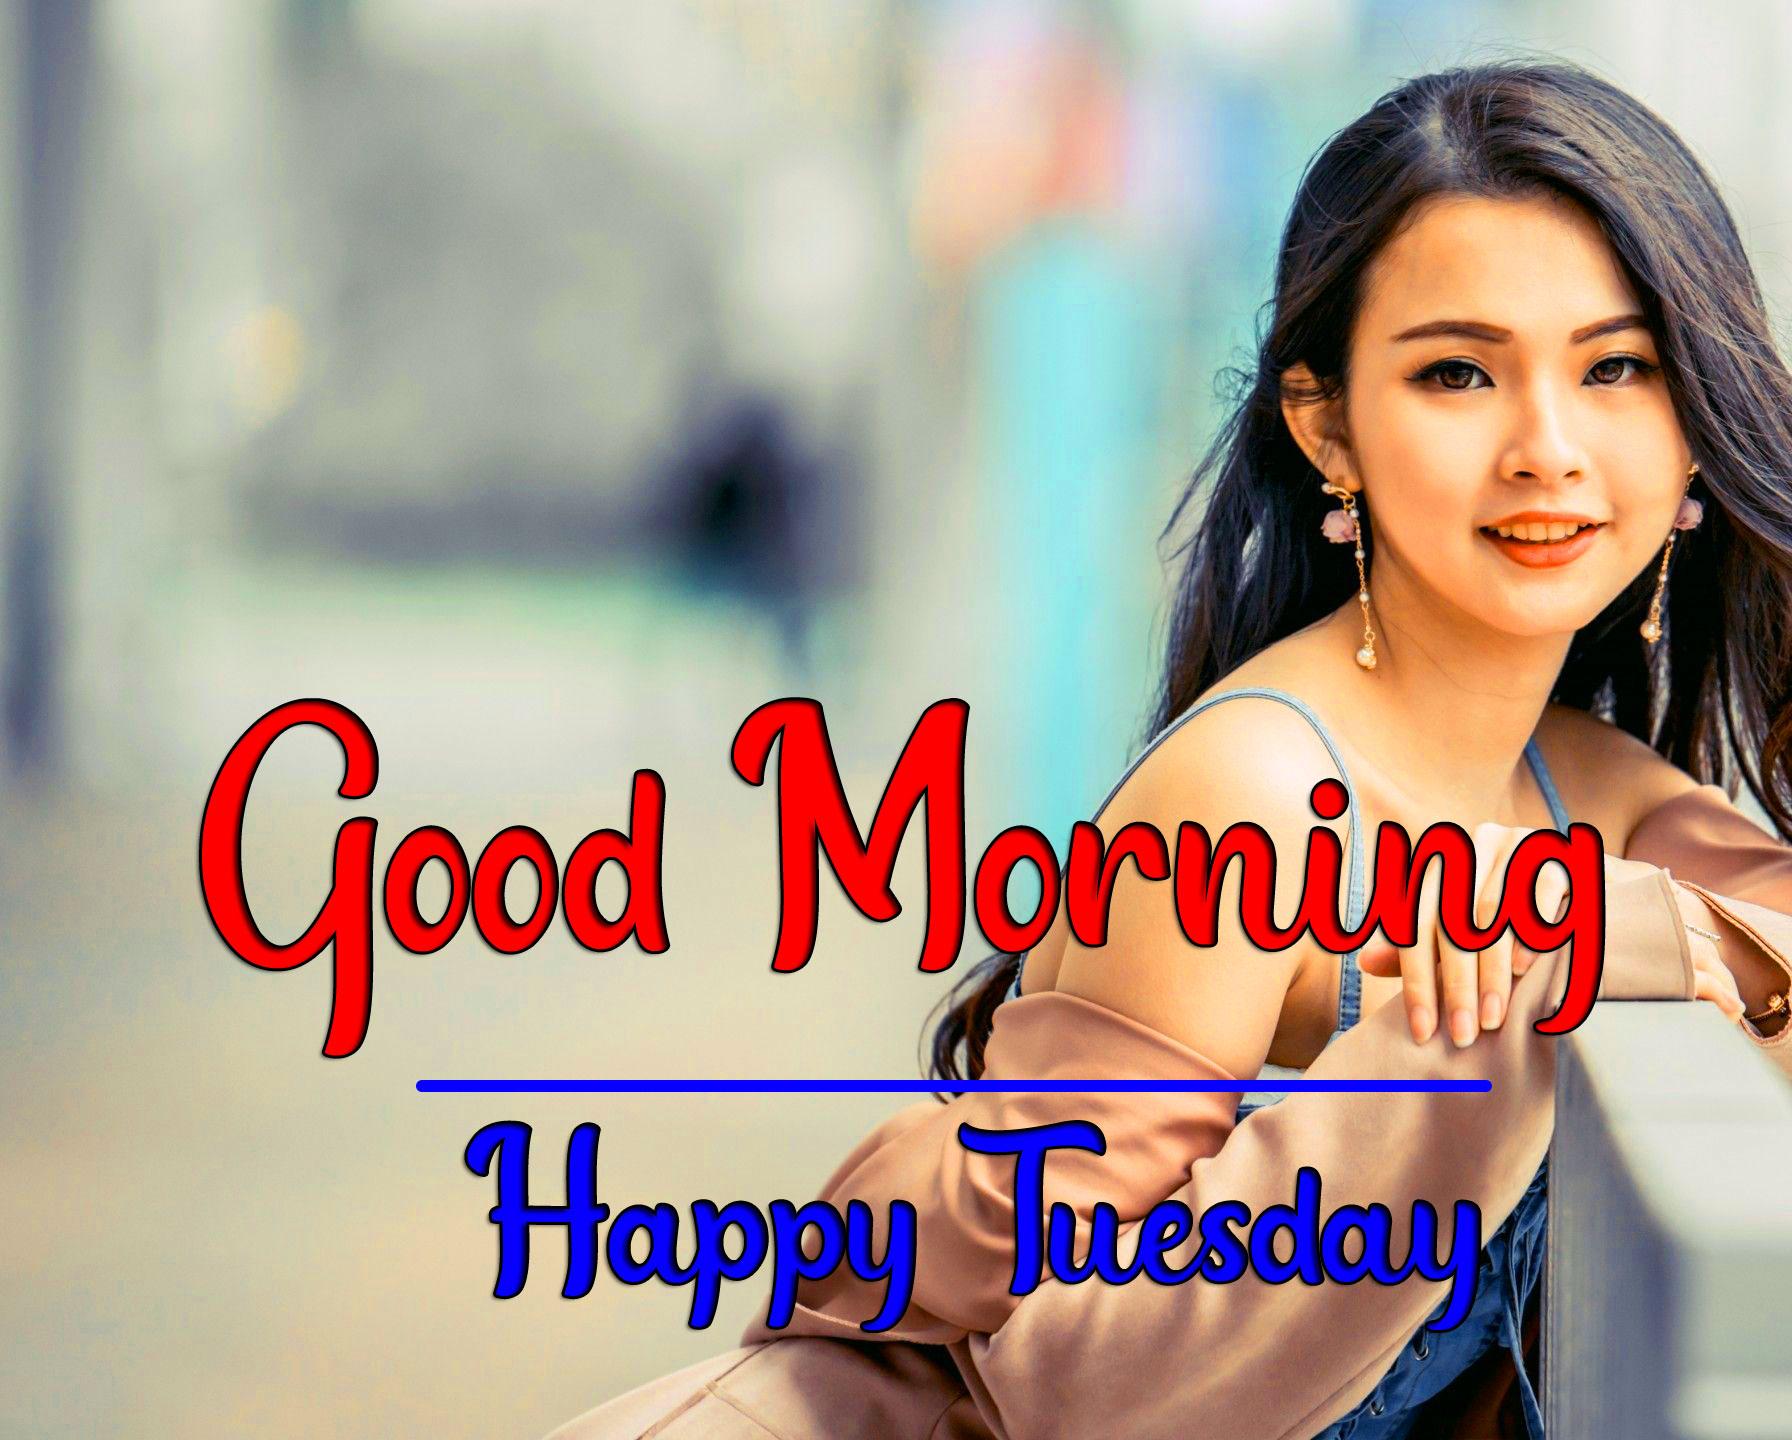 Beautiful Tuesday Good morning Pics 2021 2 1